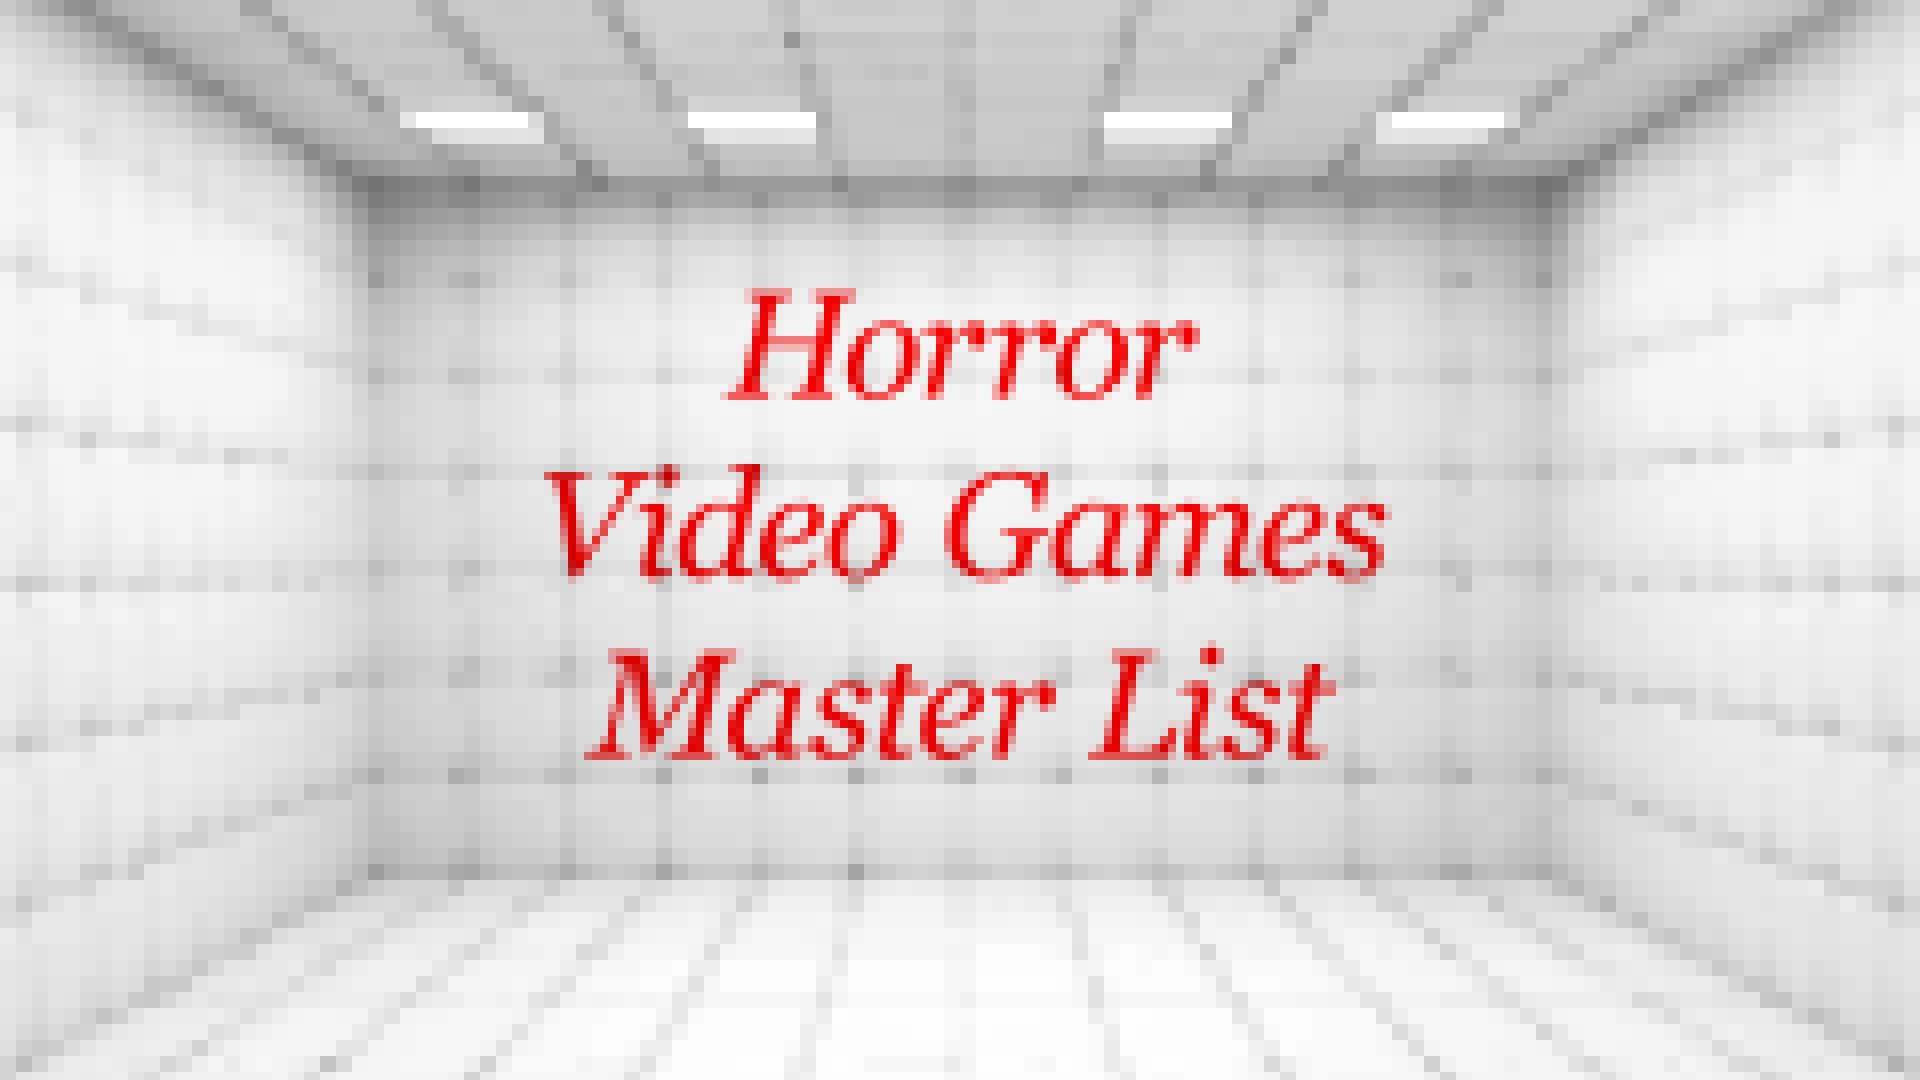 Horror Video Games Master List | Halloween Love